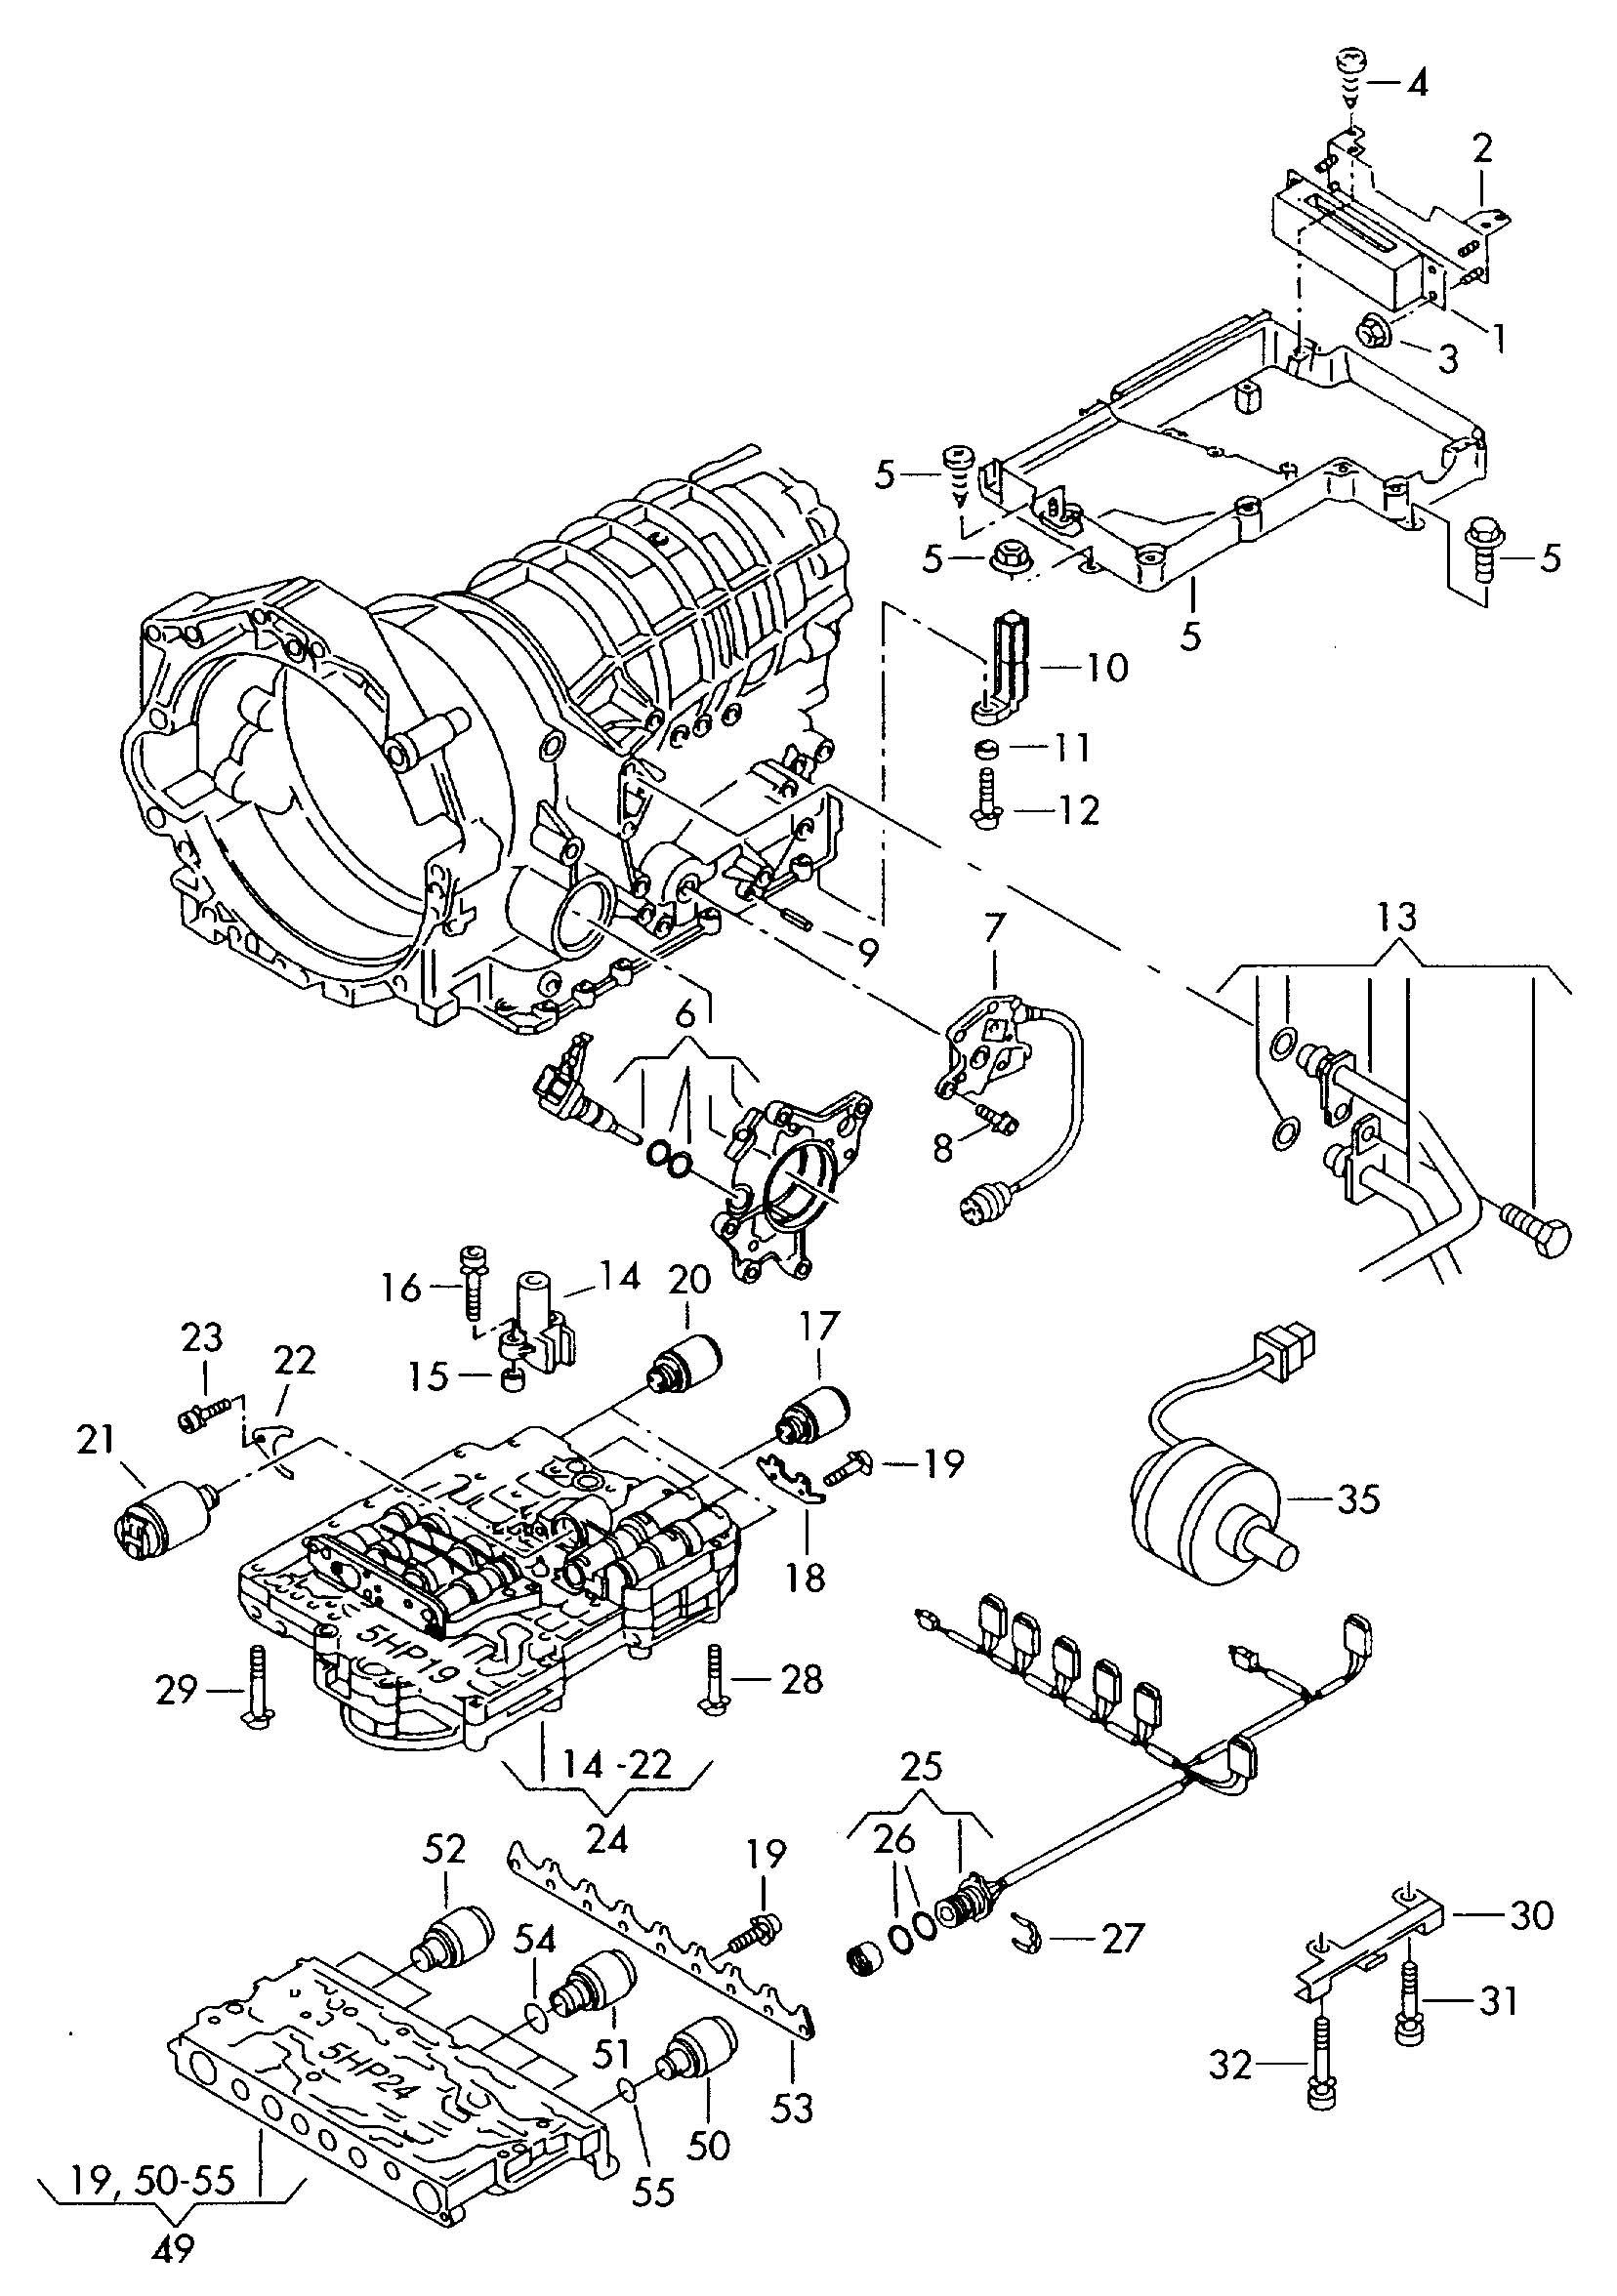 1998 vw cabrio engine diagram